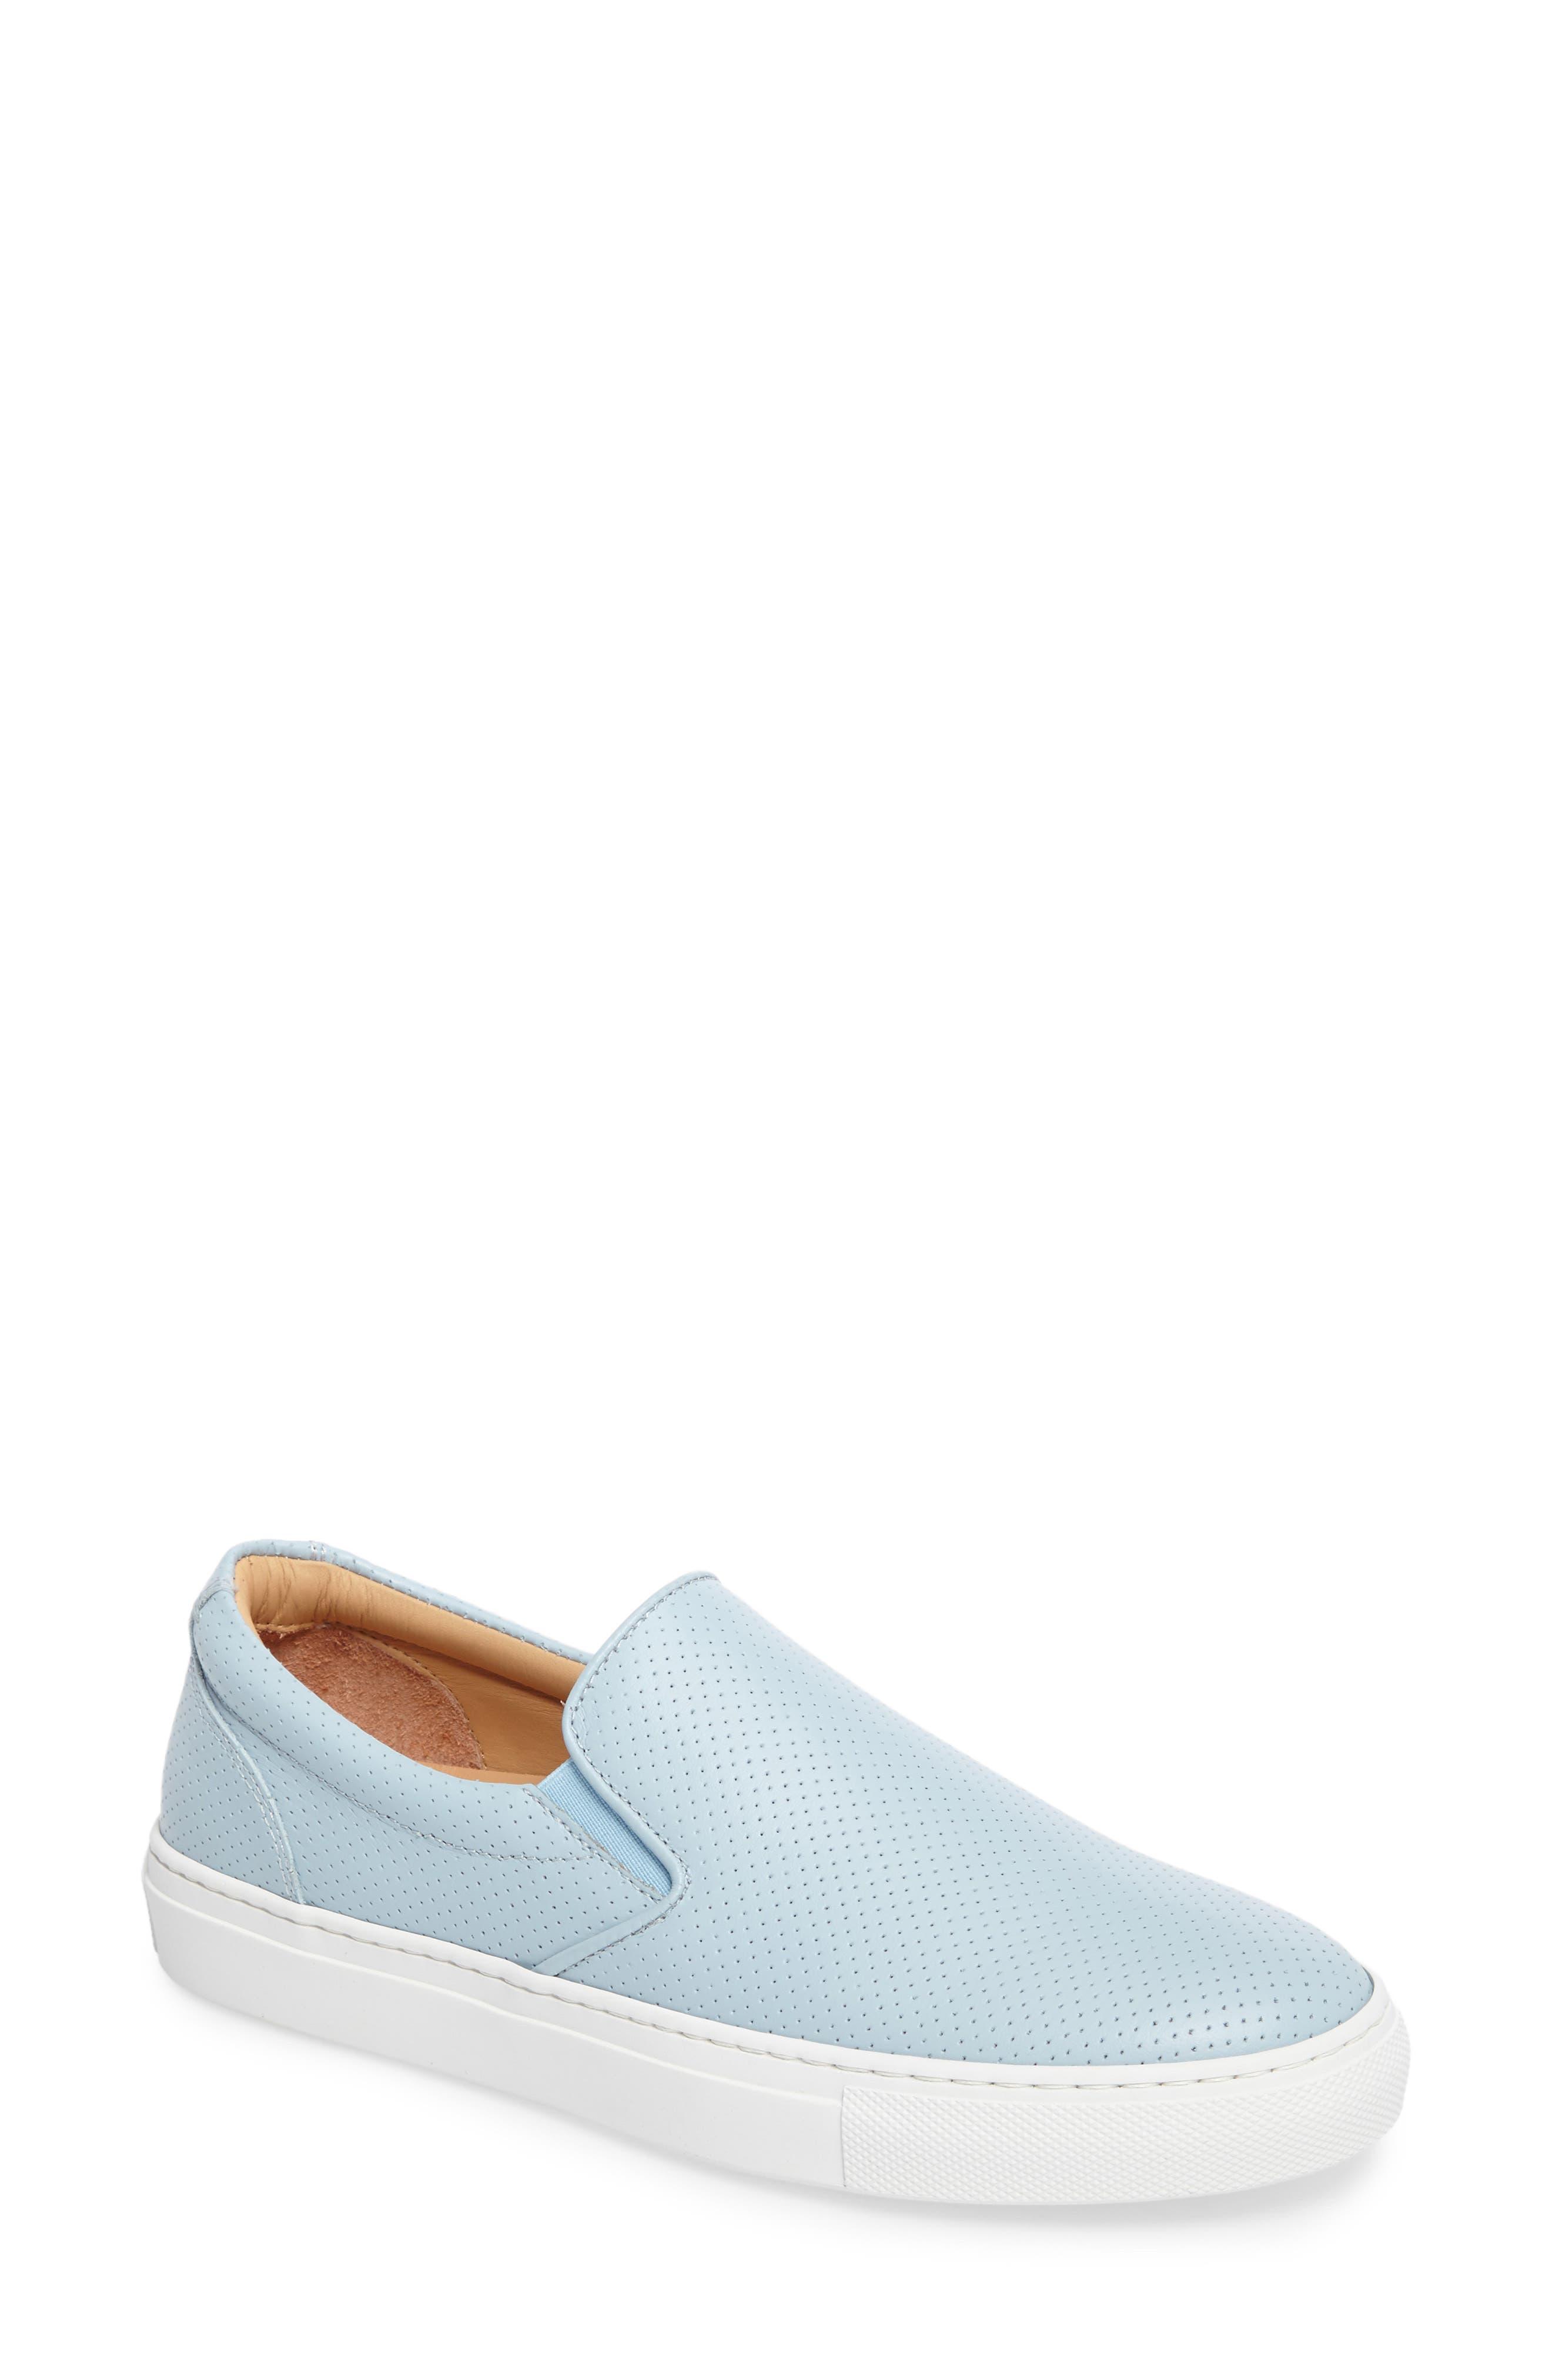 Alternate Image 1 Selected - Greats Wooster Slip-On Sneaker (Women)